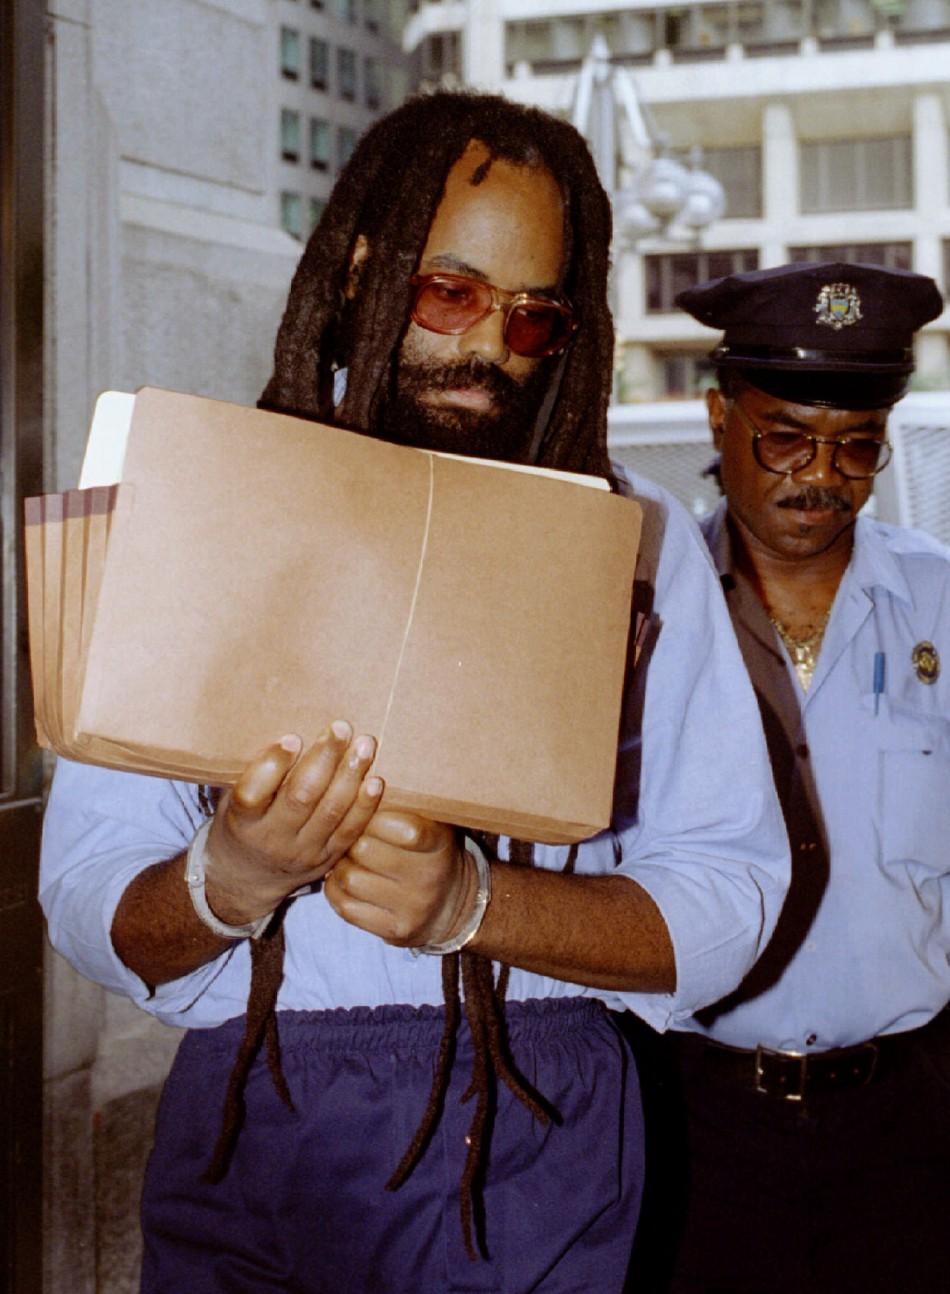 Mumia Abu-Jamal, convicted of slaying a Philadelphia policeman in 1981